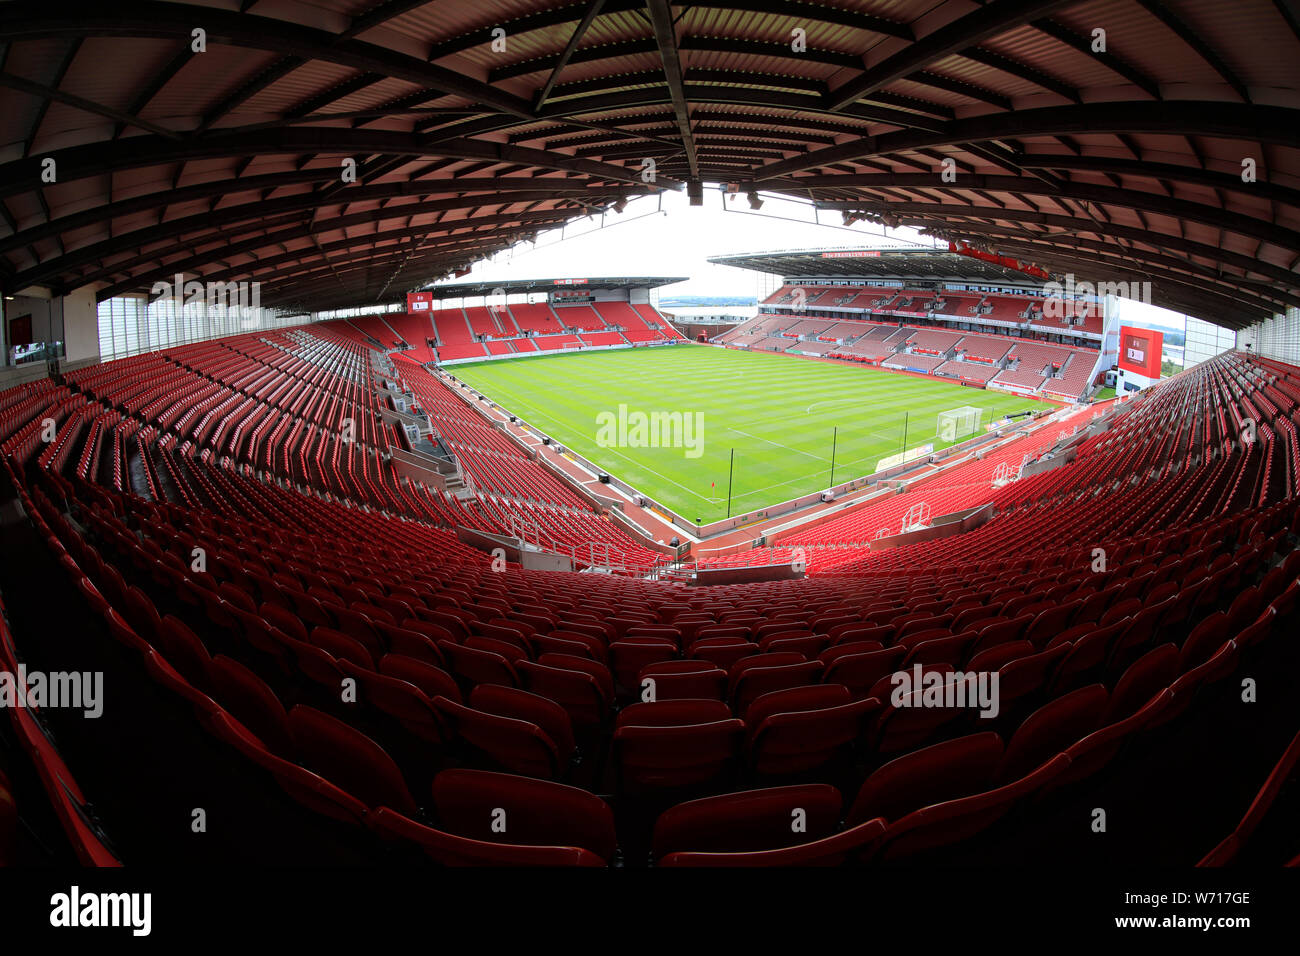 3rd August 2019, Bet365 Stadium, Stoke-on-Trent, England